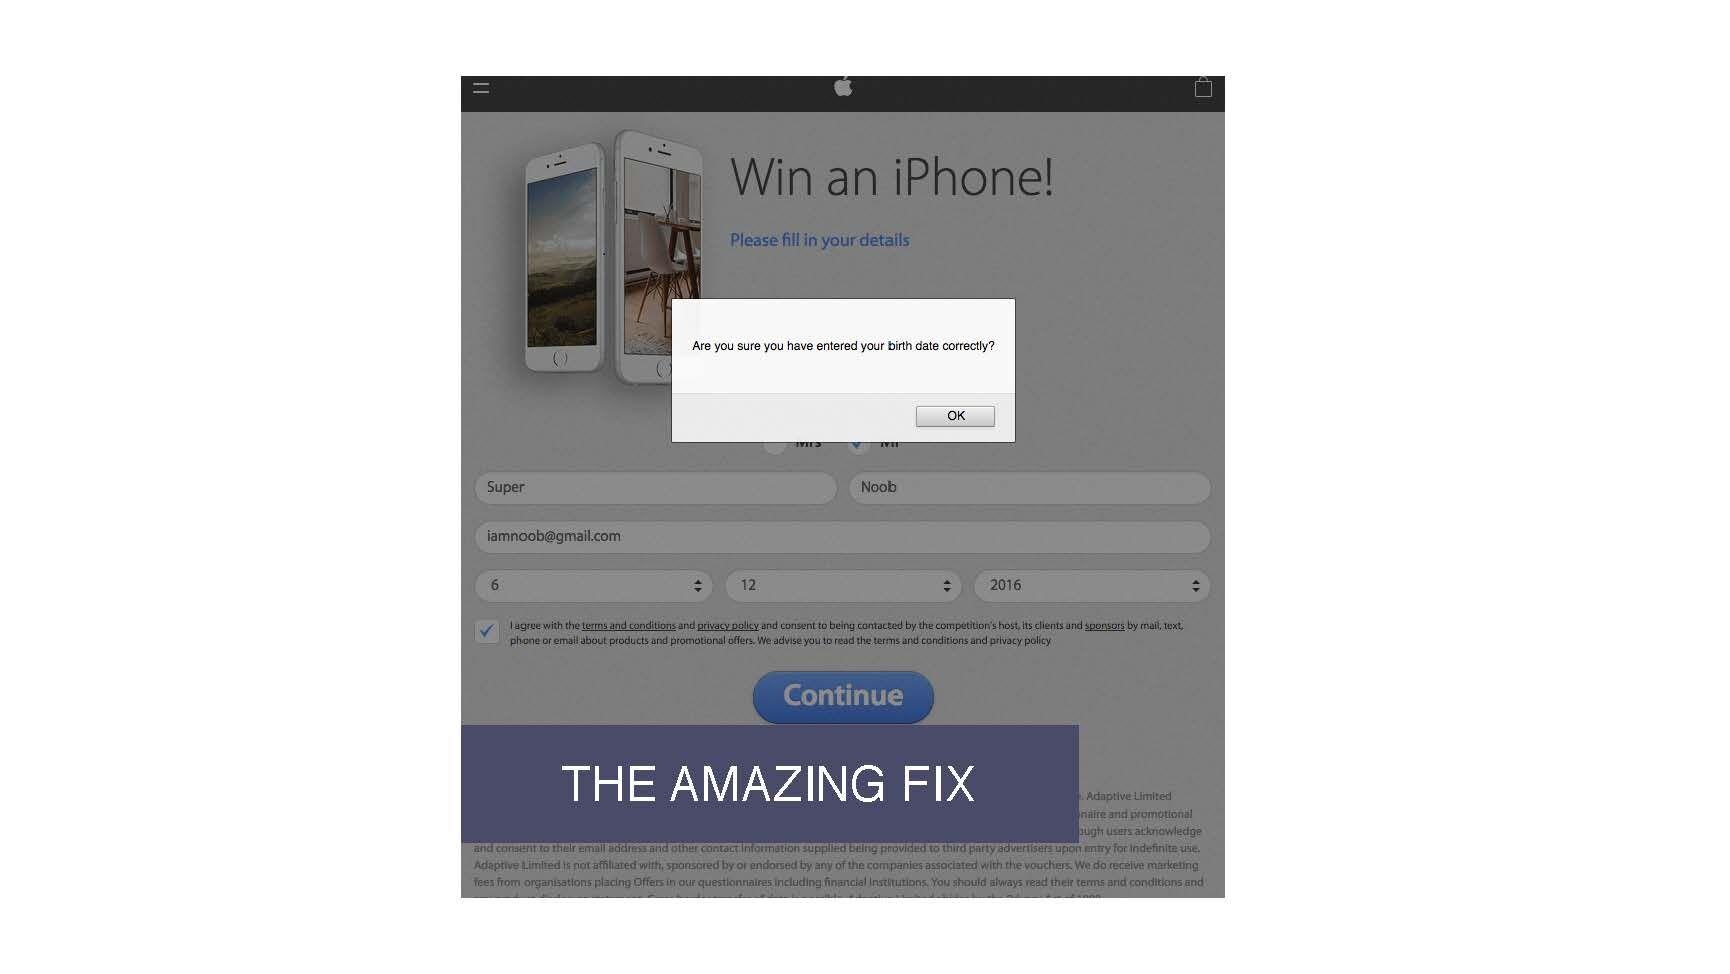 Alexander Willemsen - The Amazing Fix